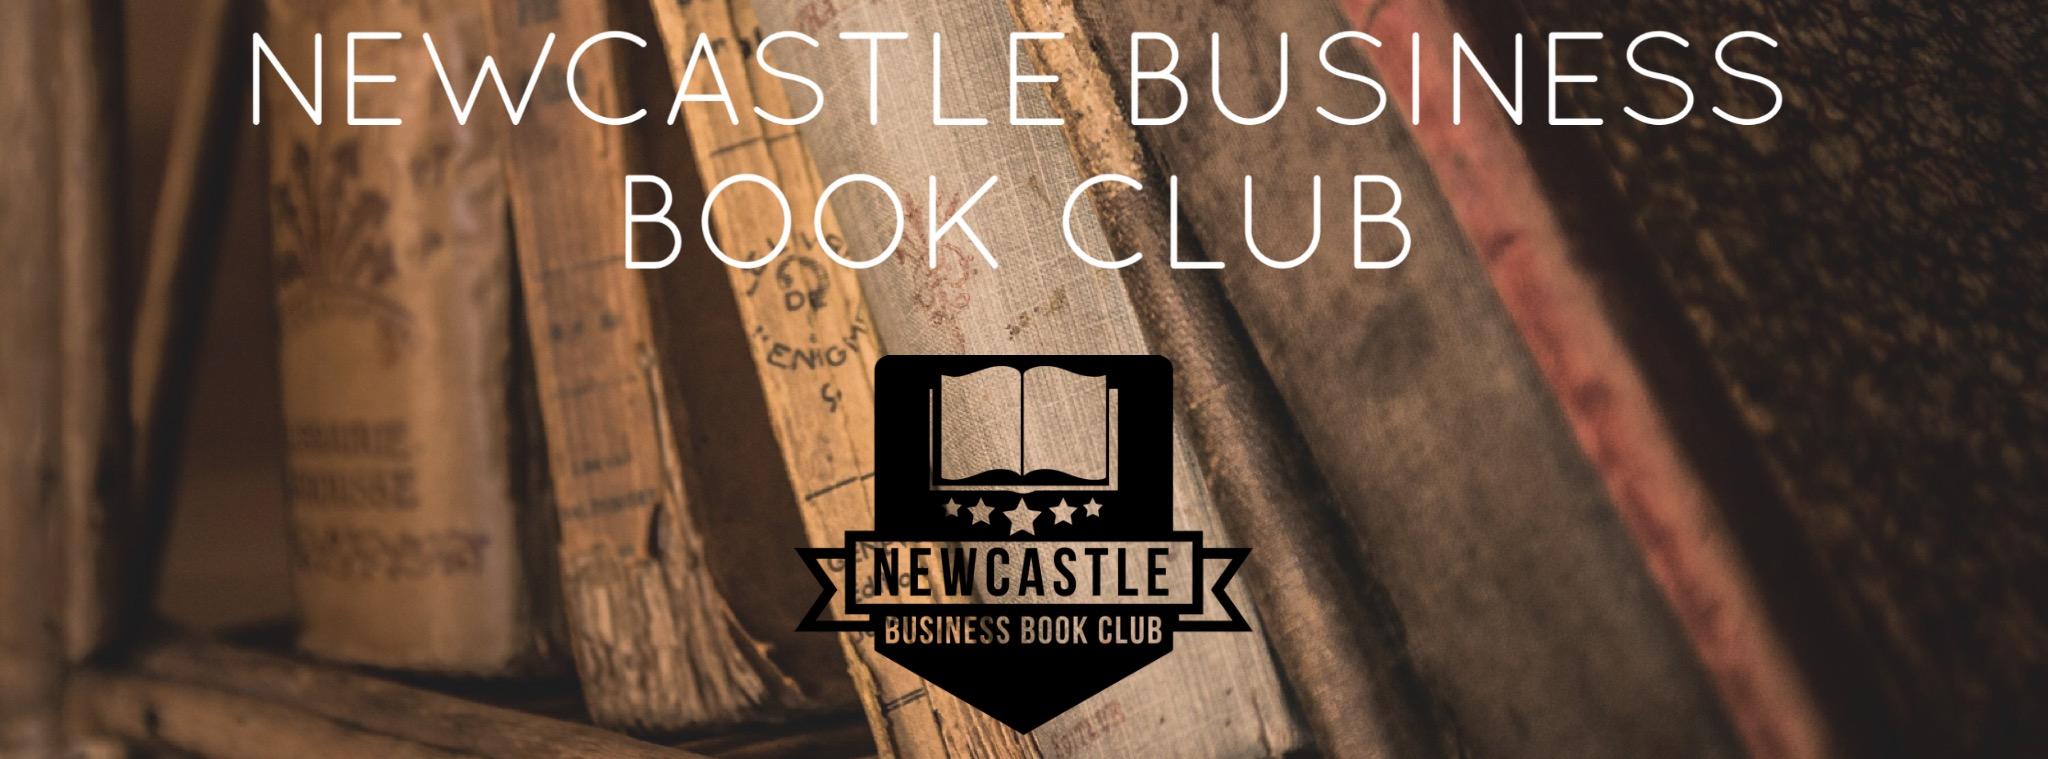 newcastle business book club